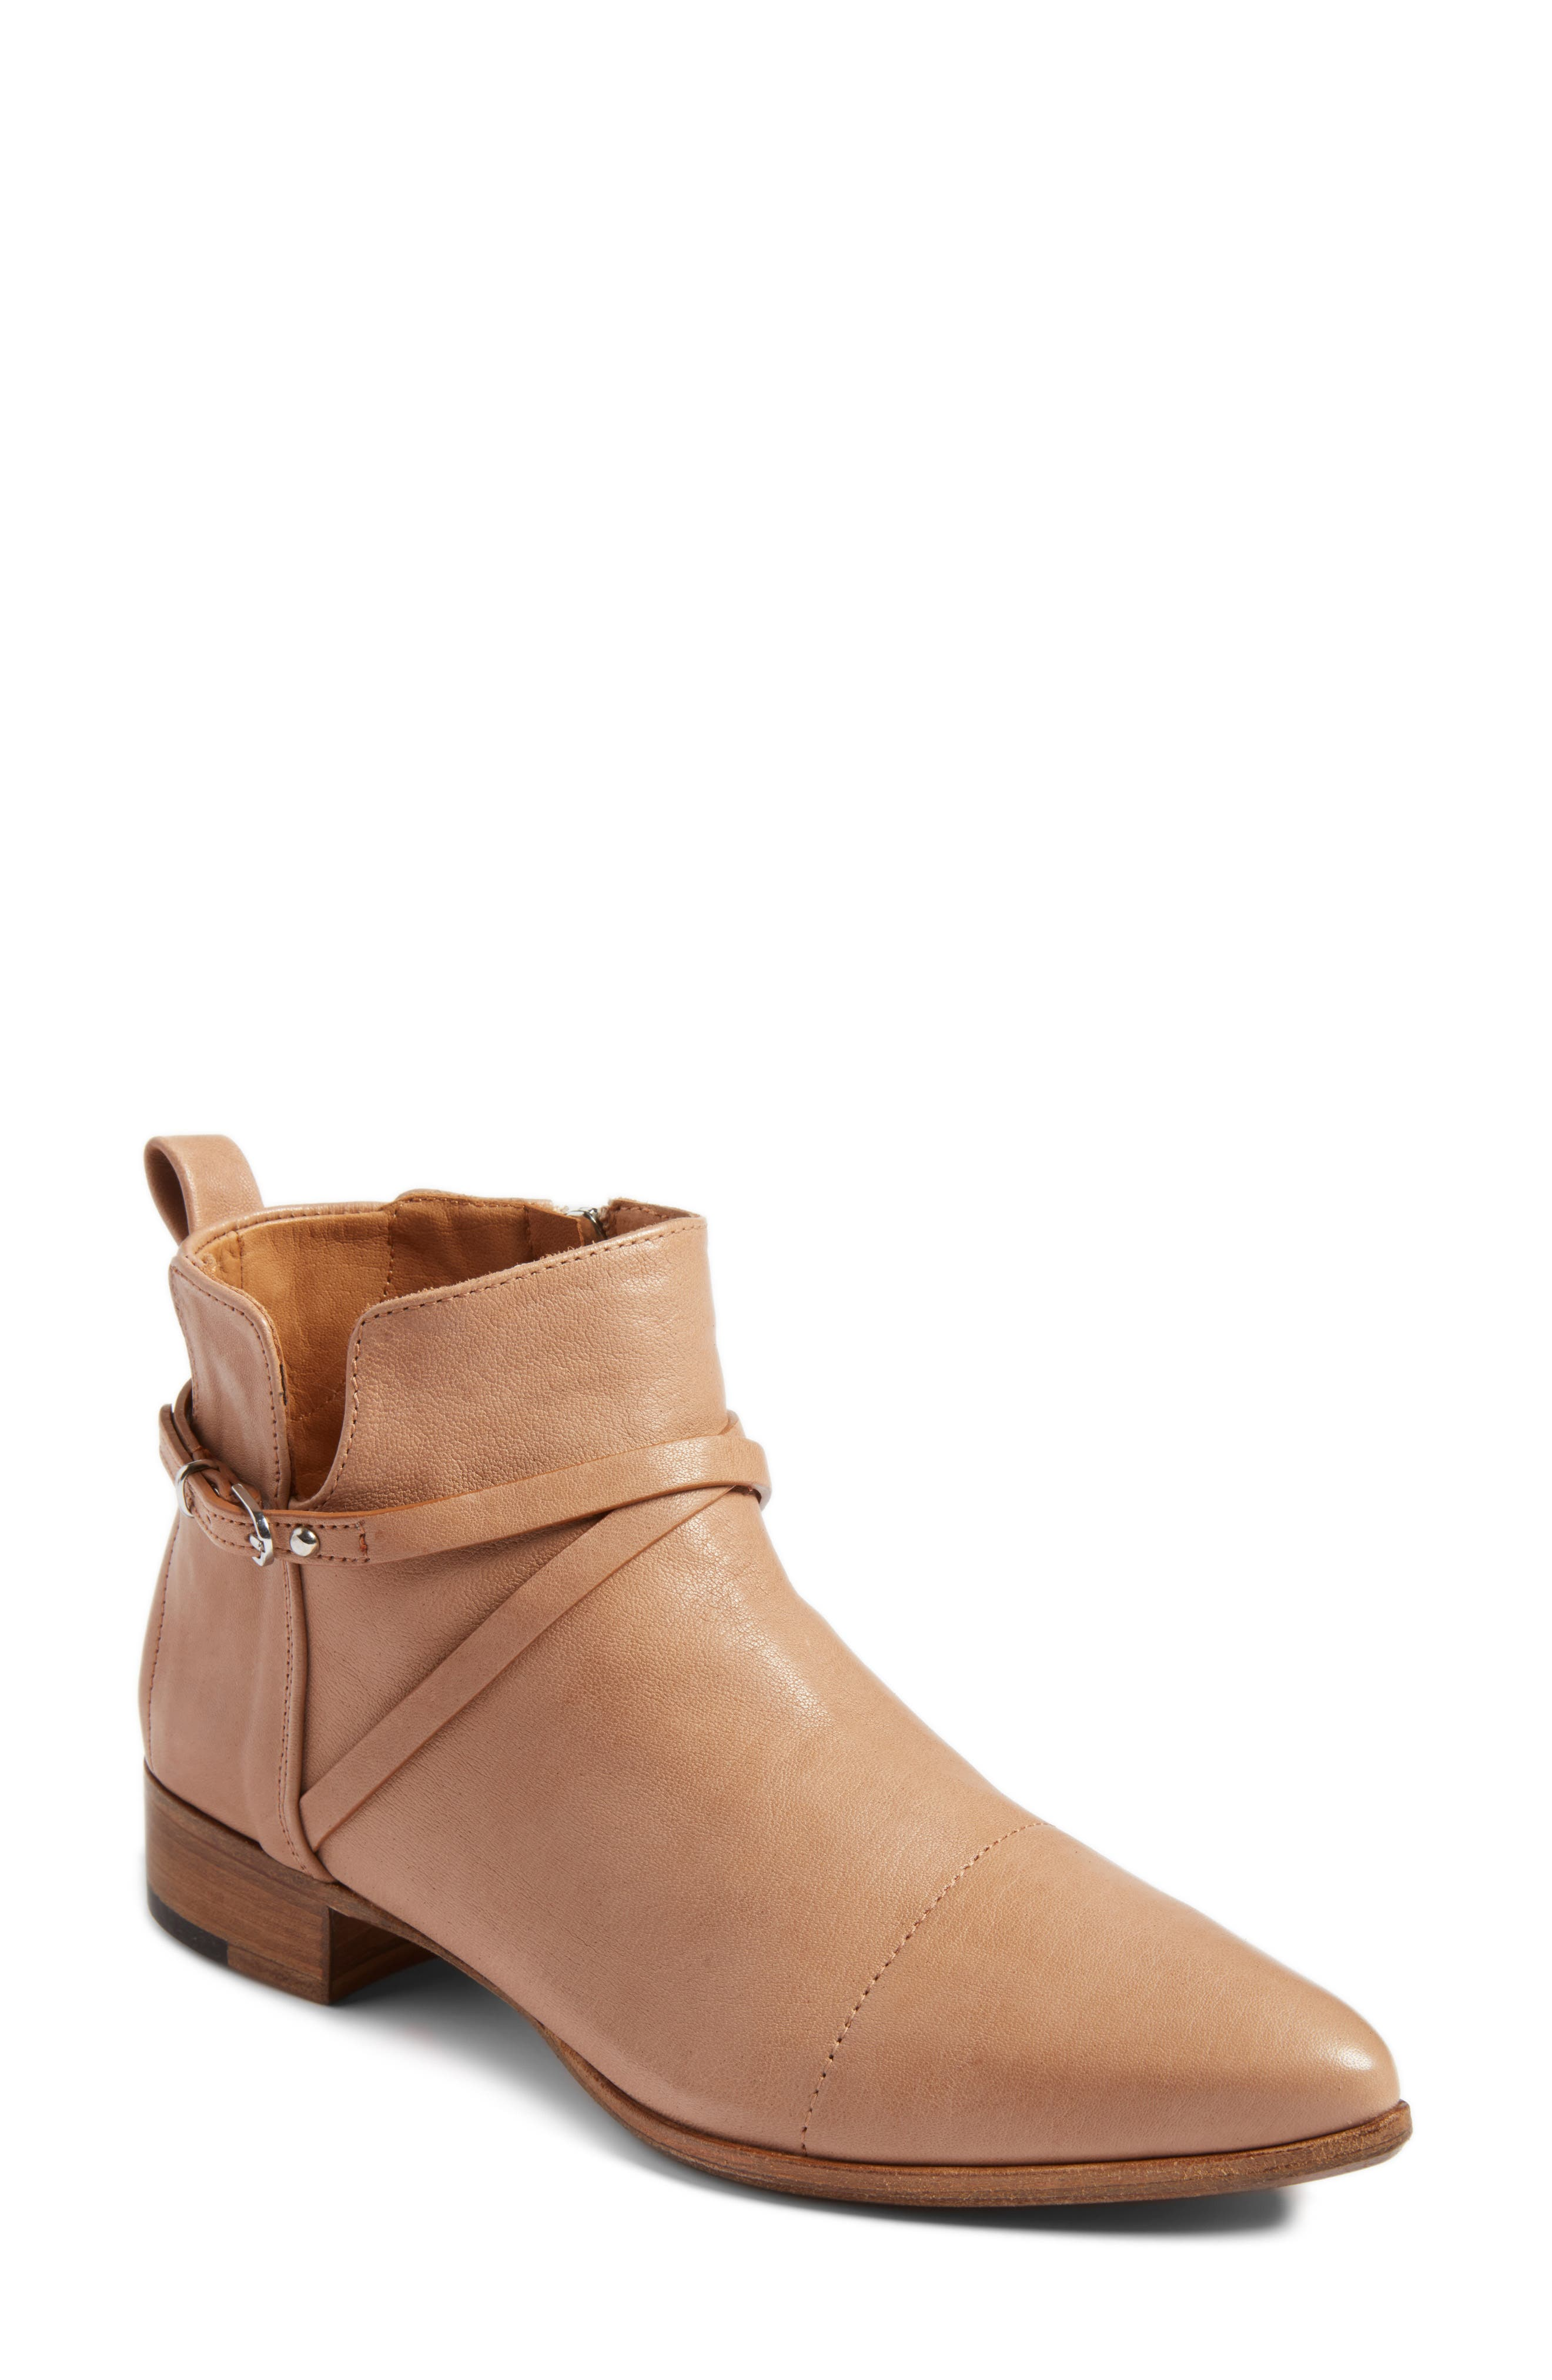 Alberto Fermani 'Mea' Ankle Boot (Women) (Nordstrom Exclusive)